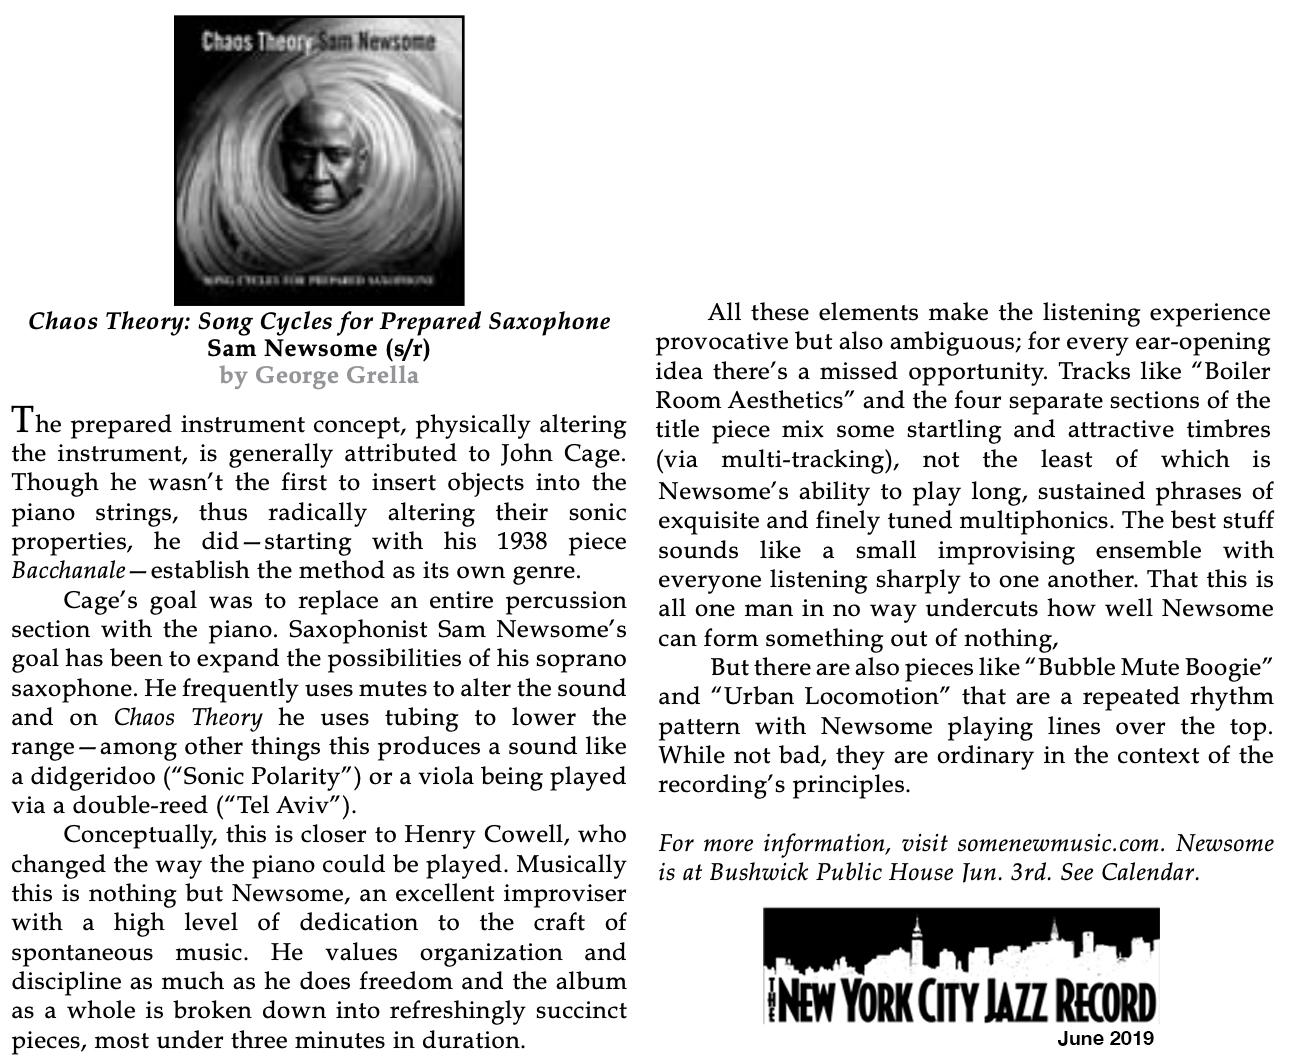 REVIEW: New York City Jazz Record Reviews Sam Newsome's